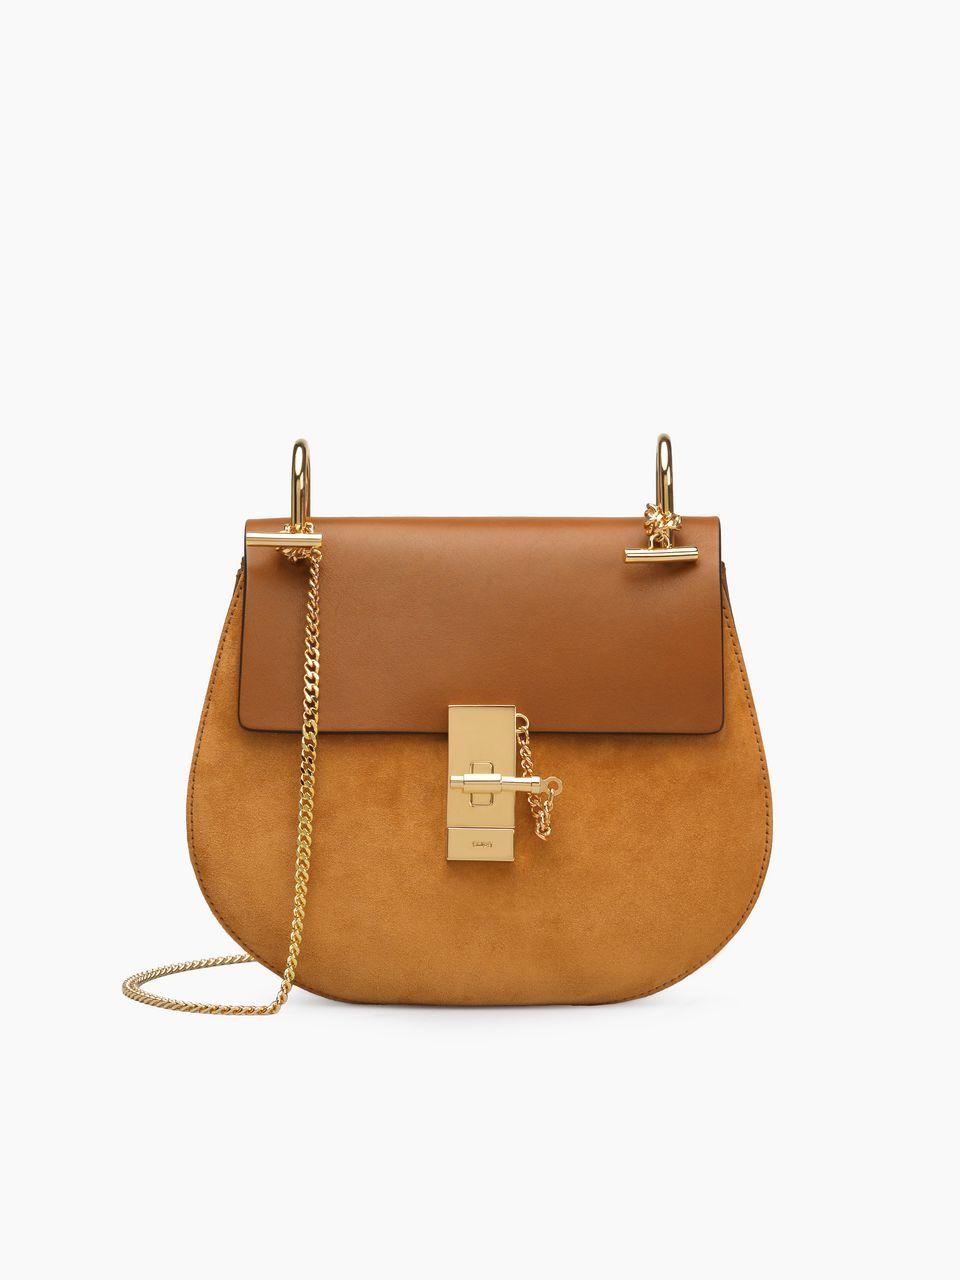 90f217617921 Top 10 Designer Handbag Must Haves — Silk and Ginger